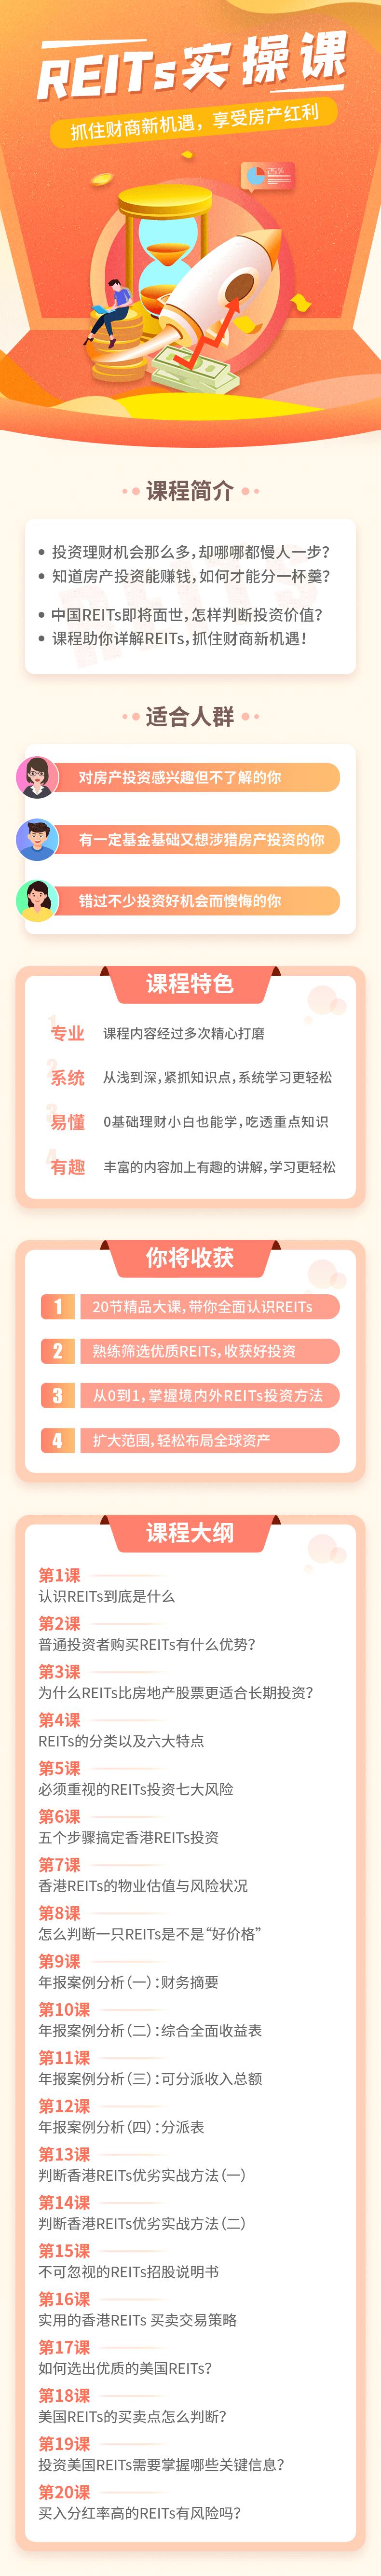 REITs投资课落地页面改.png